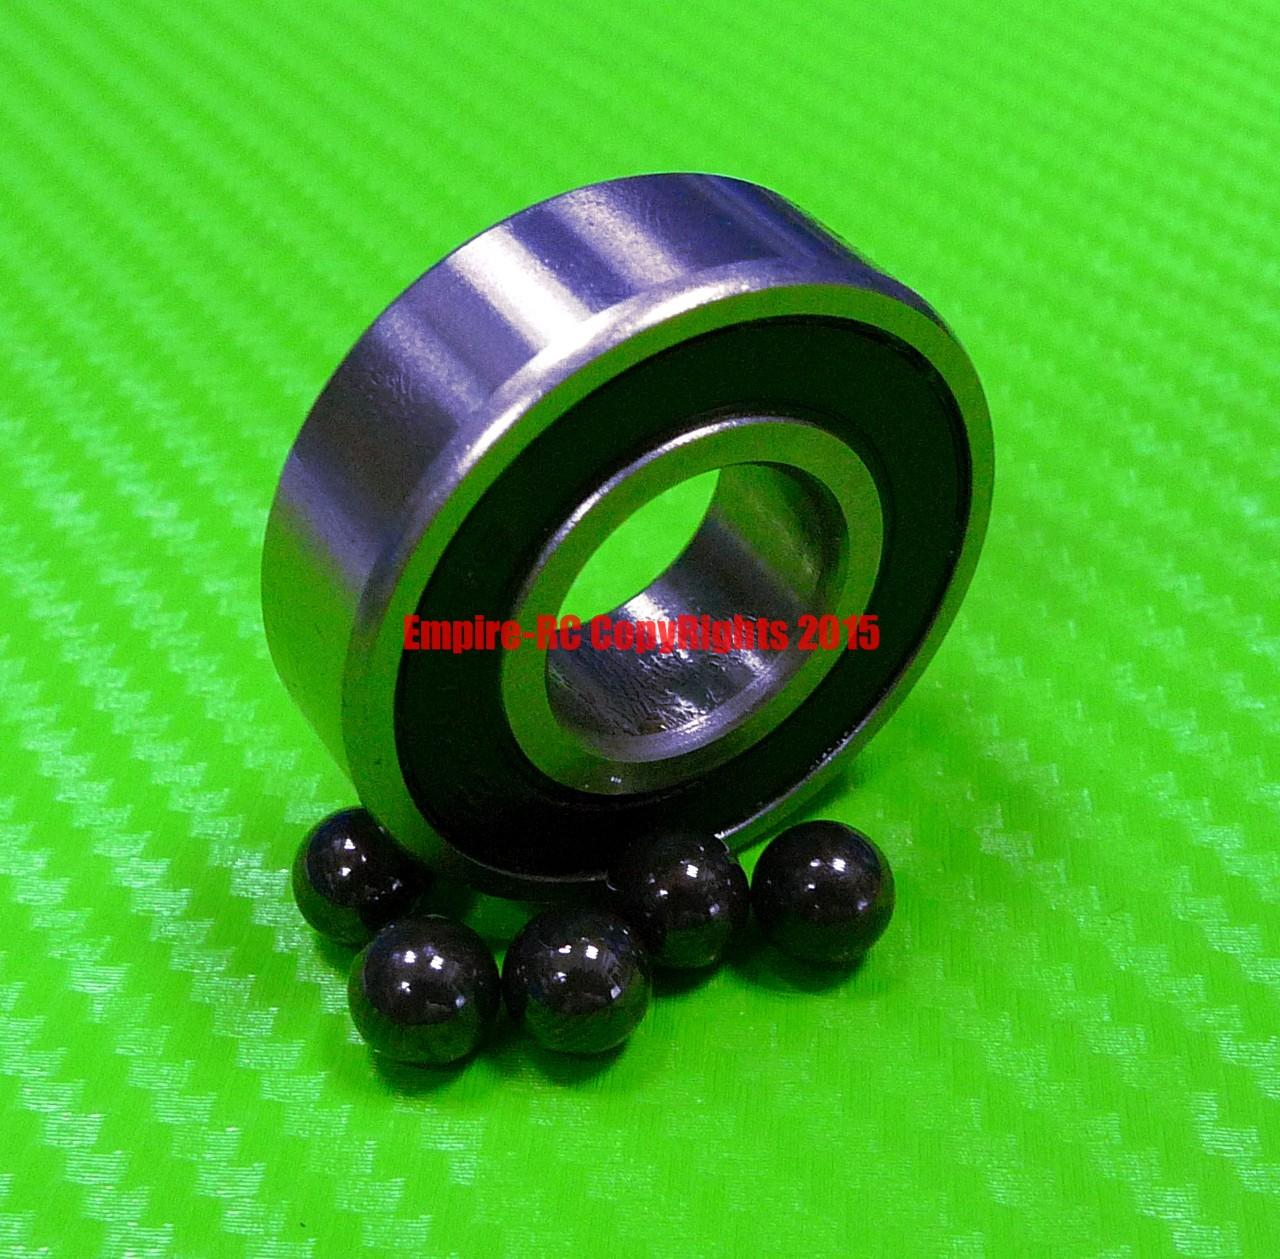 1PCS 16001-2RS Hybrid Ceramic Chrome Metal Bearing Bearings 16001RS 12x28x7 mm